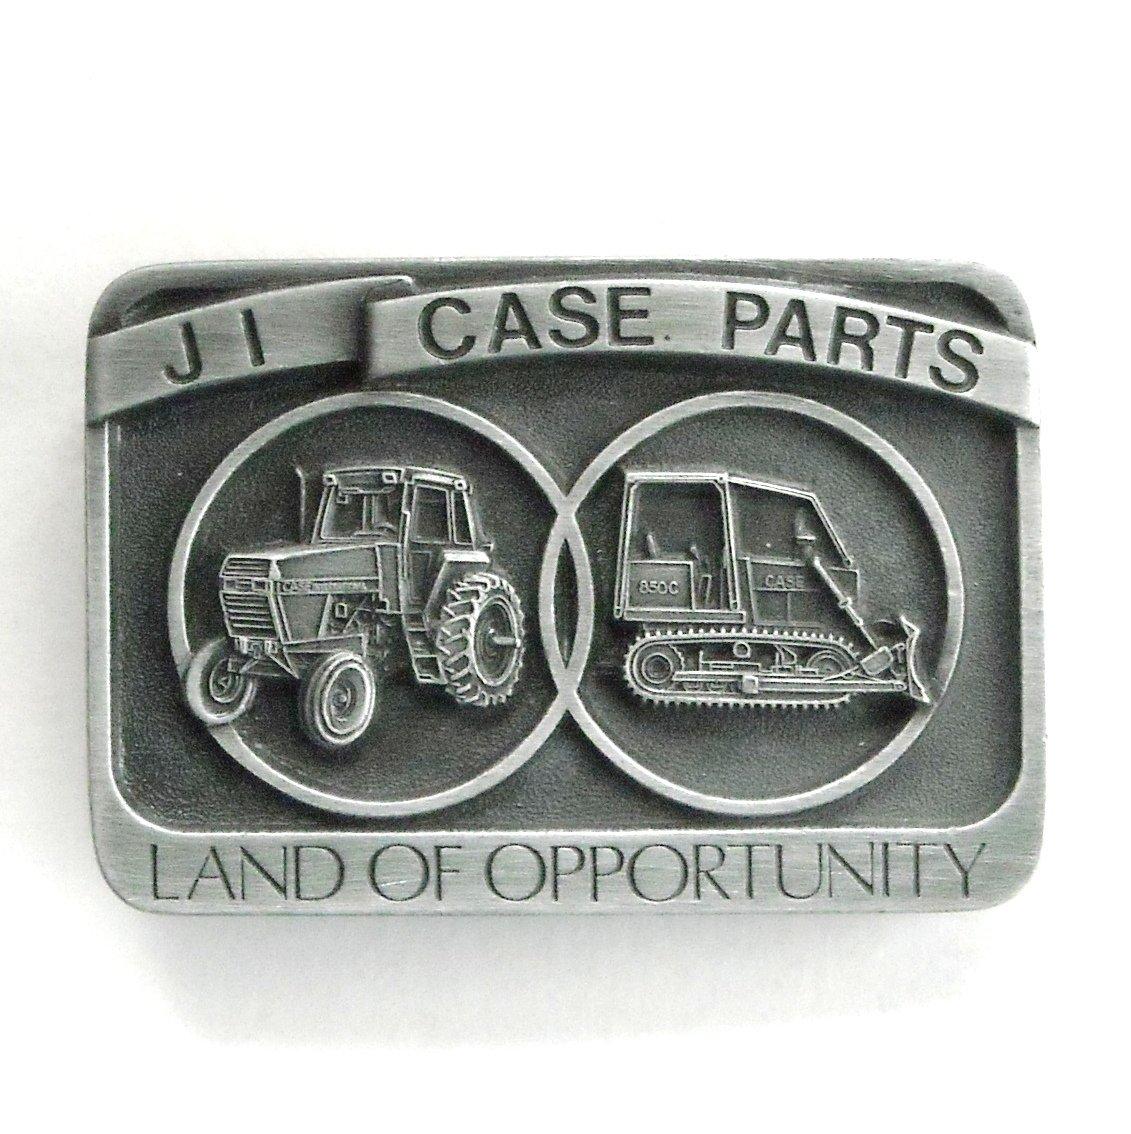 JI Case Parts Land Of Opportunity pewter belt buckle